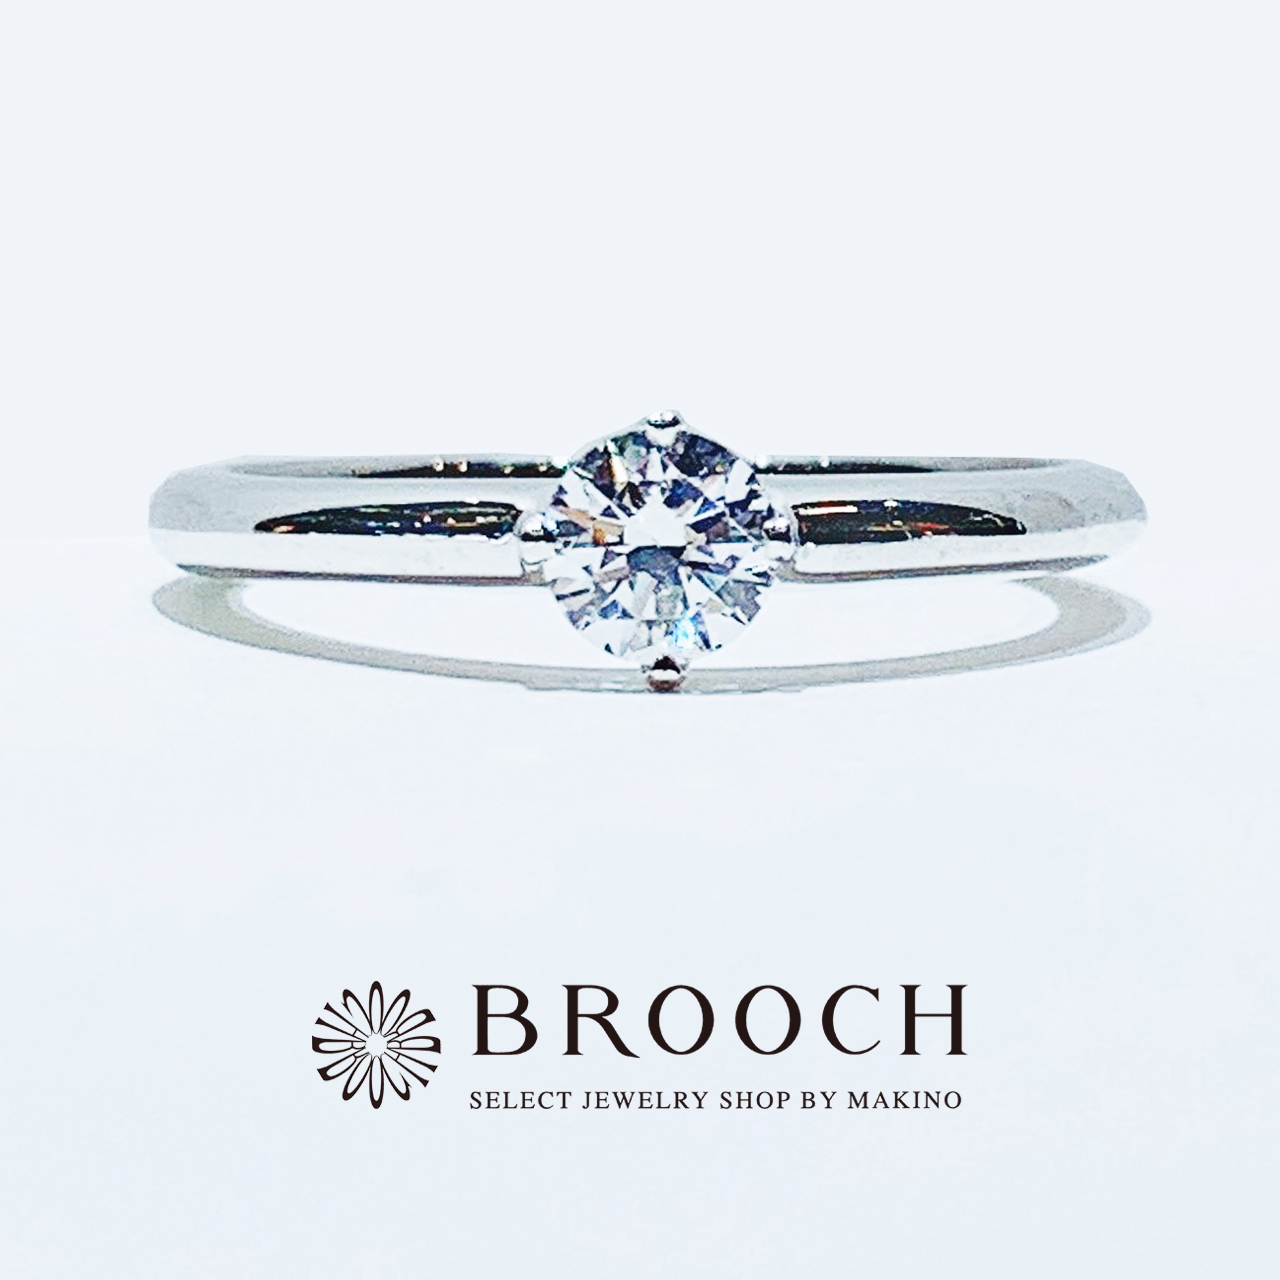 BROOCH 婚約指輪 エンゲージリング シンプル 1石ストレートデザイン